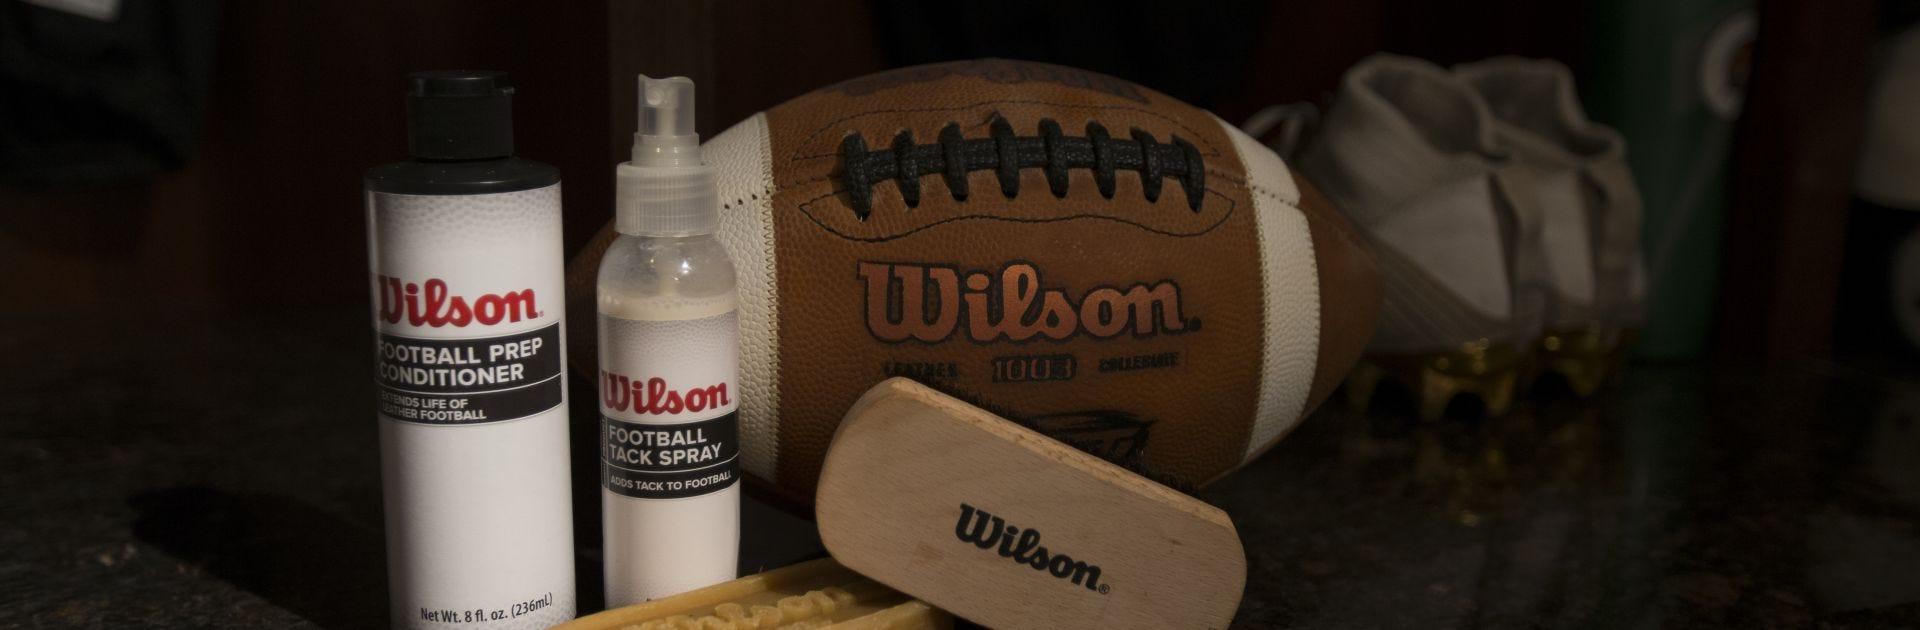 Wilson Football Prep Accessories